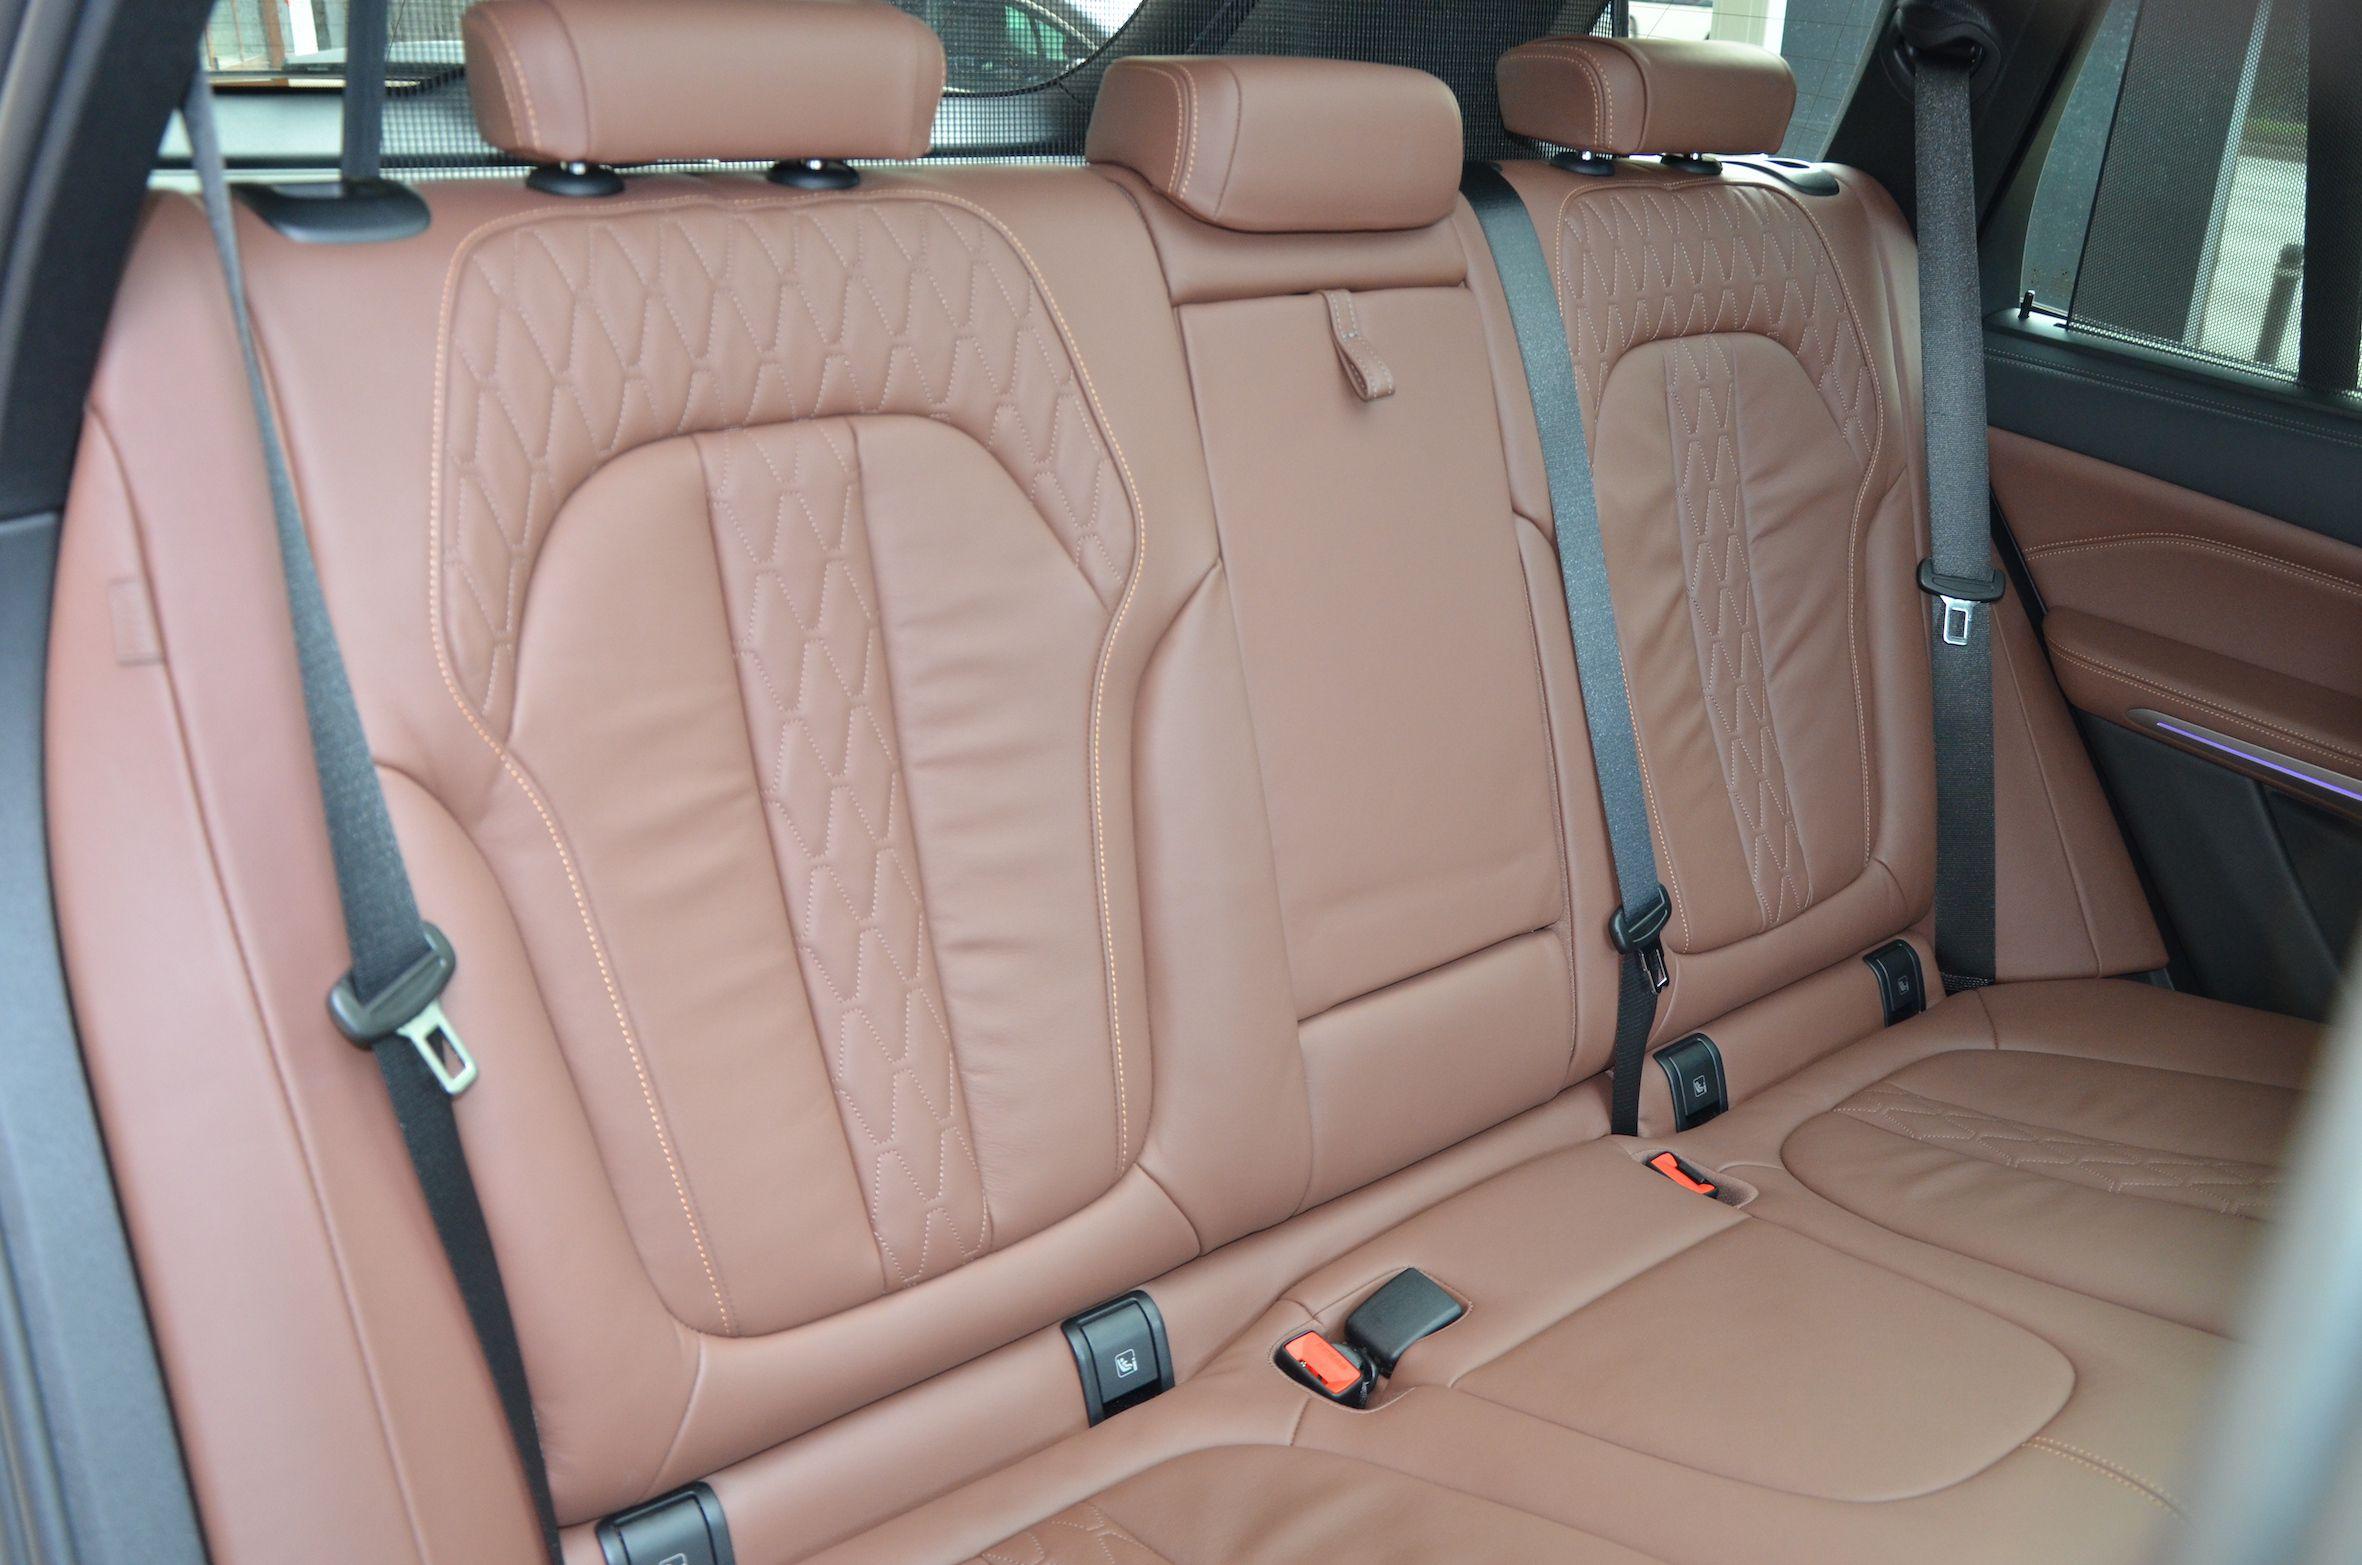 x5-30d-m-sportpaket-new-modell-77-11